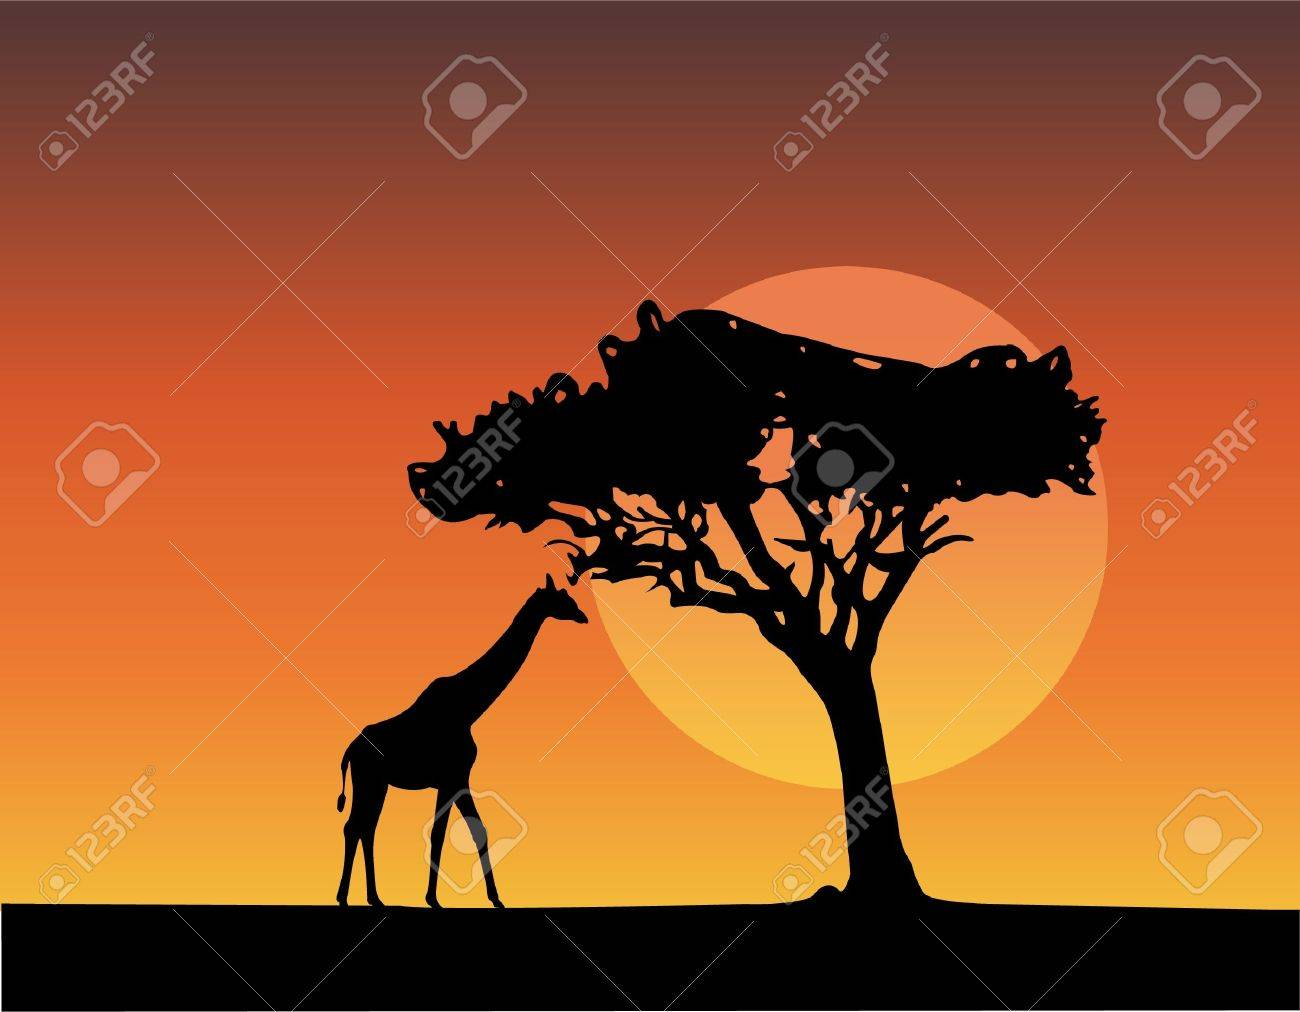 africa safari silhouettes of giraffe Stock Vector - 9132177